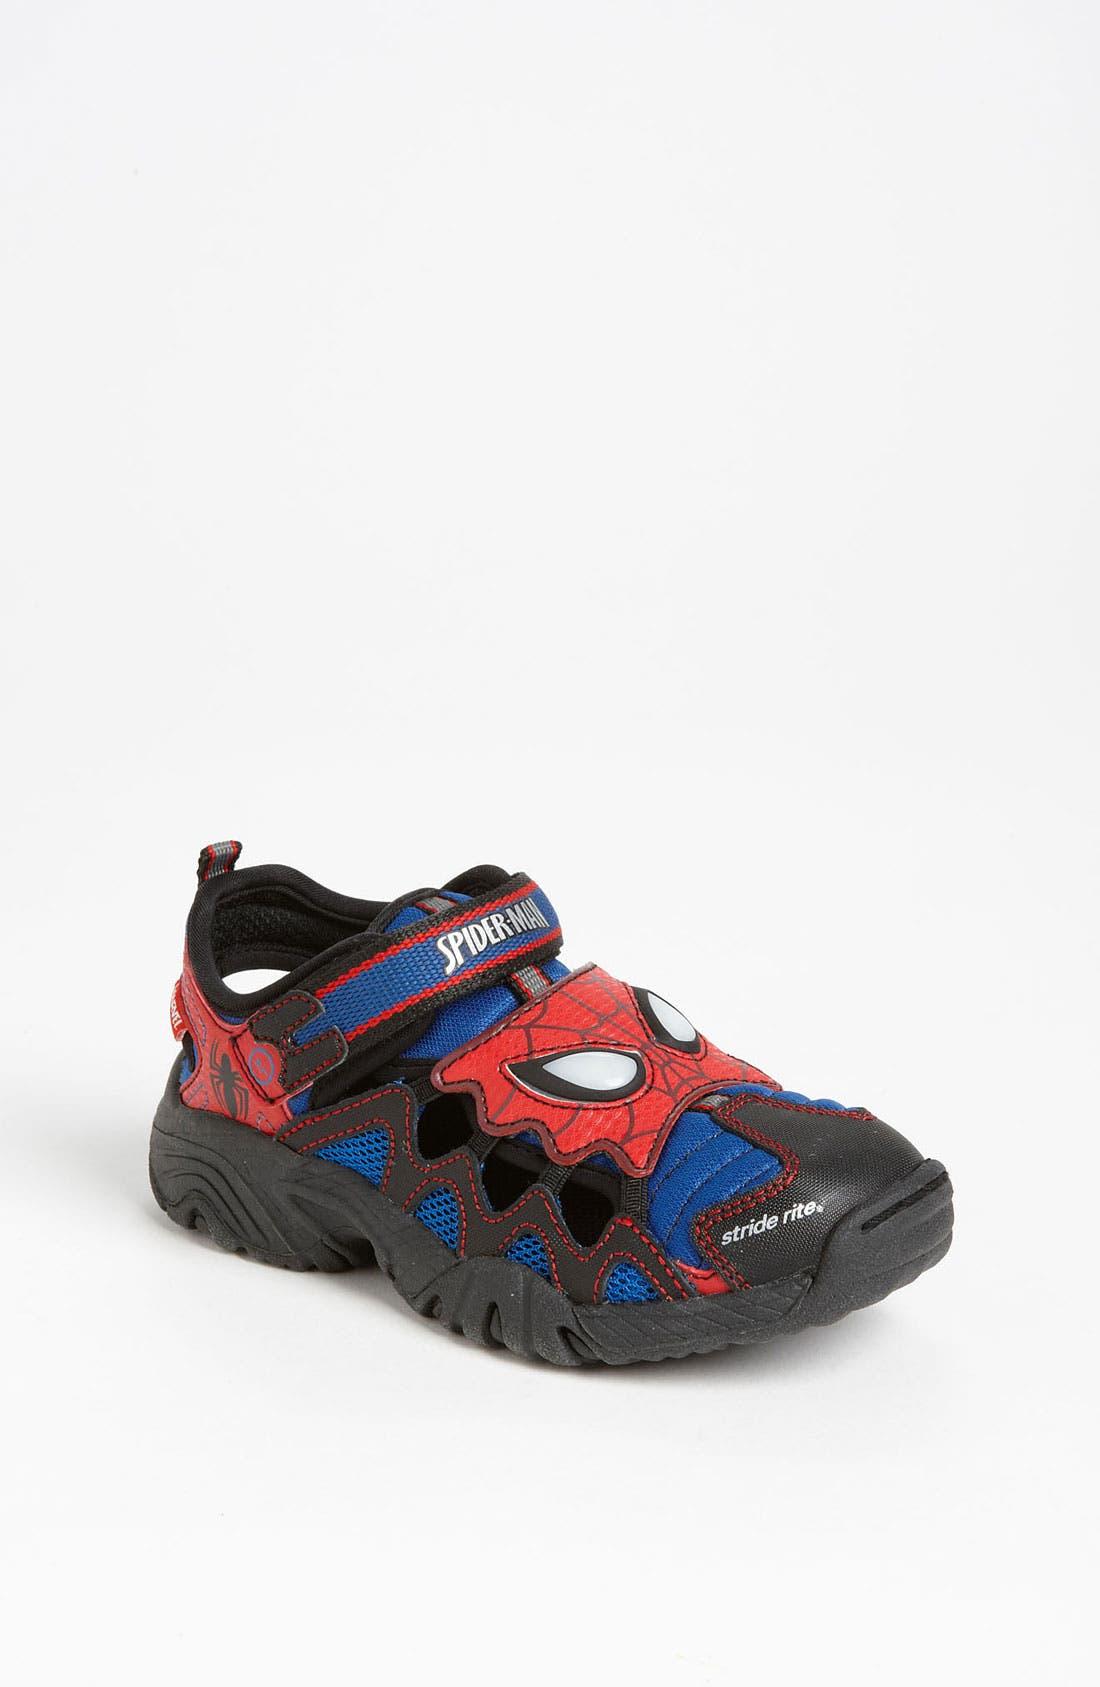 Main Image - Stride Rite 'Spider-Man®' Sandal (Toddler & Little Kid)